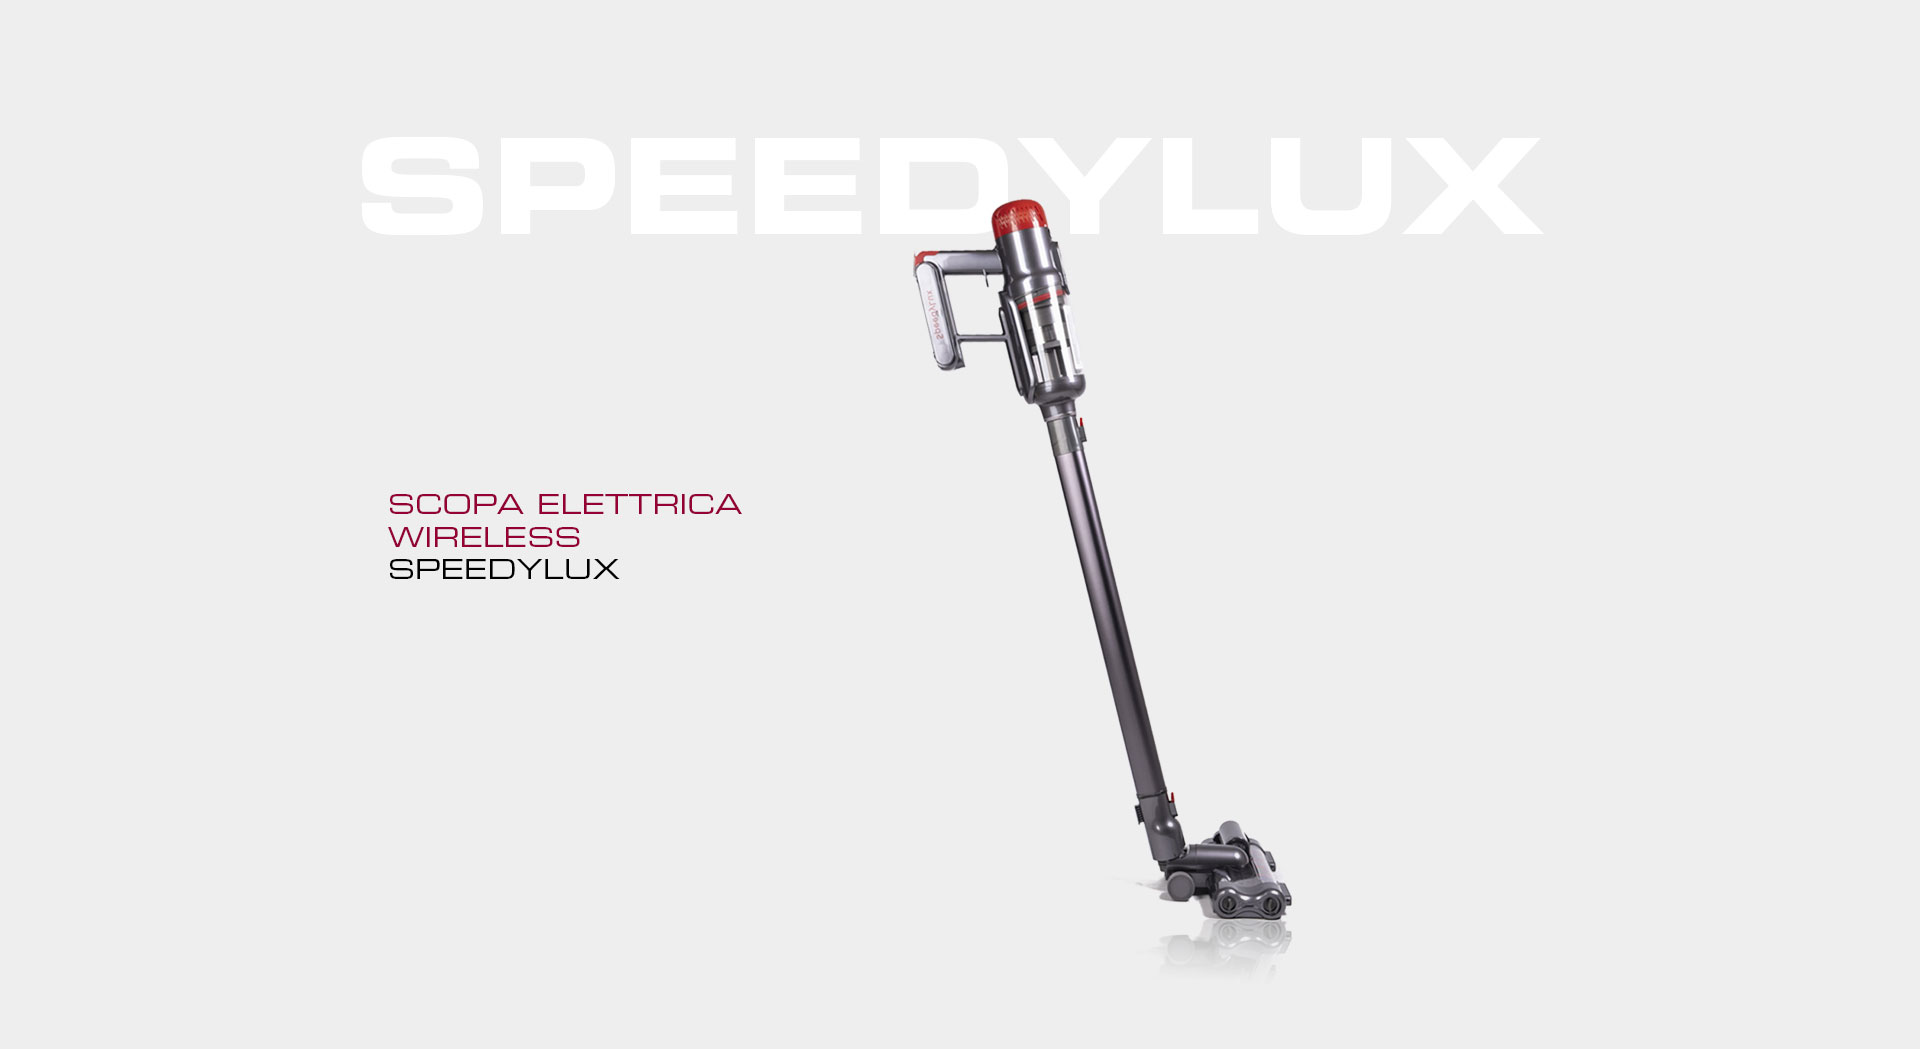 speedylux, scopa, elettrica, wireless, ricarica, design